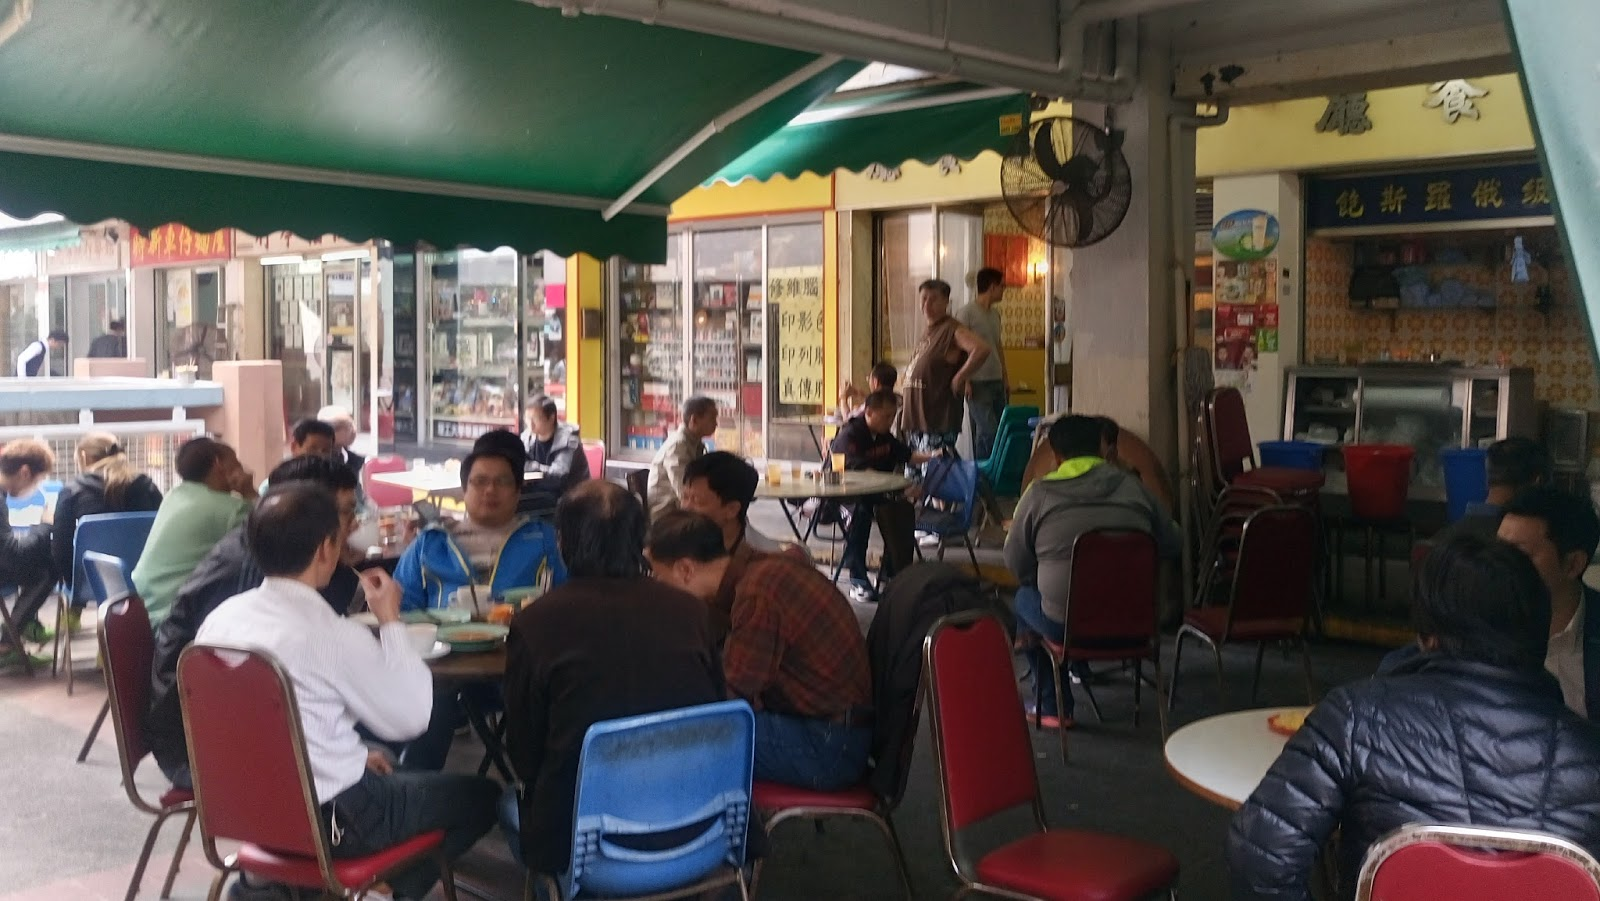 香港魂: 隠れ家茶餐廳シリーズ~榮樂茶餐廳